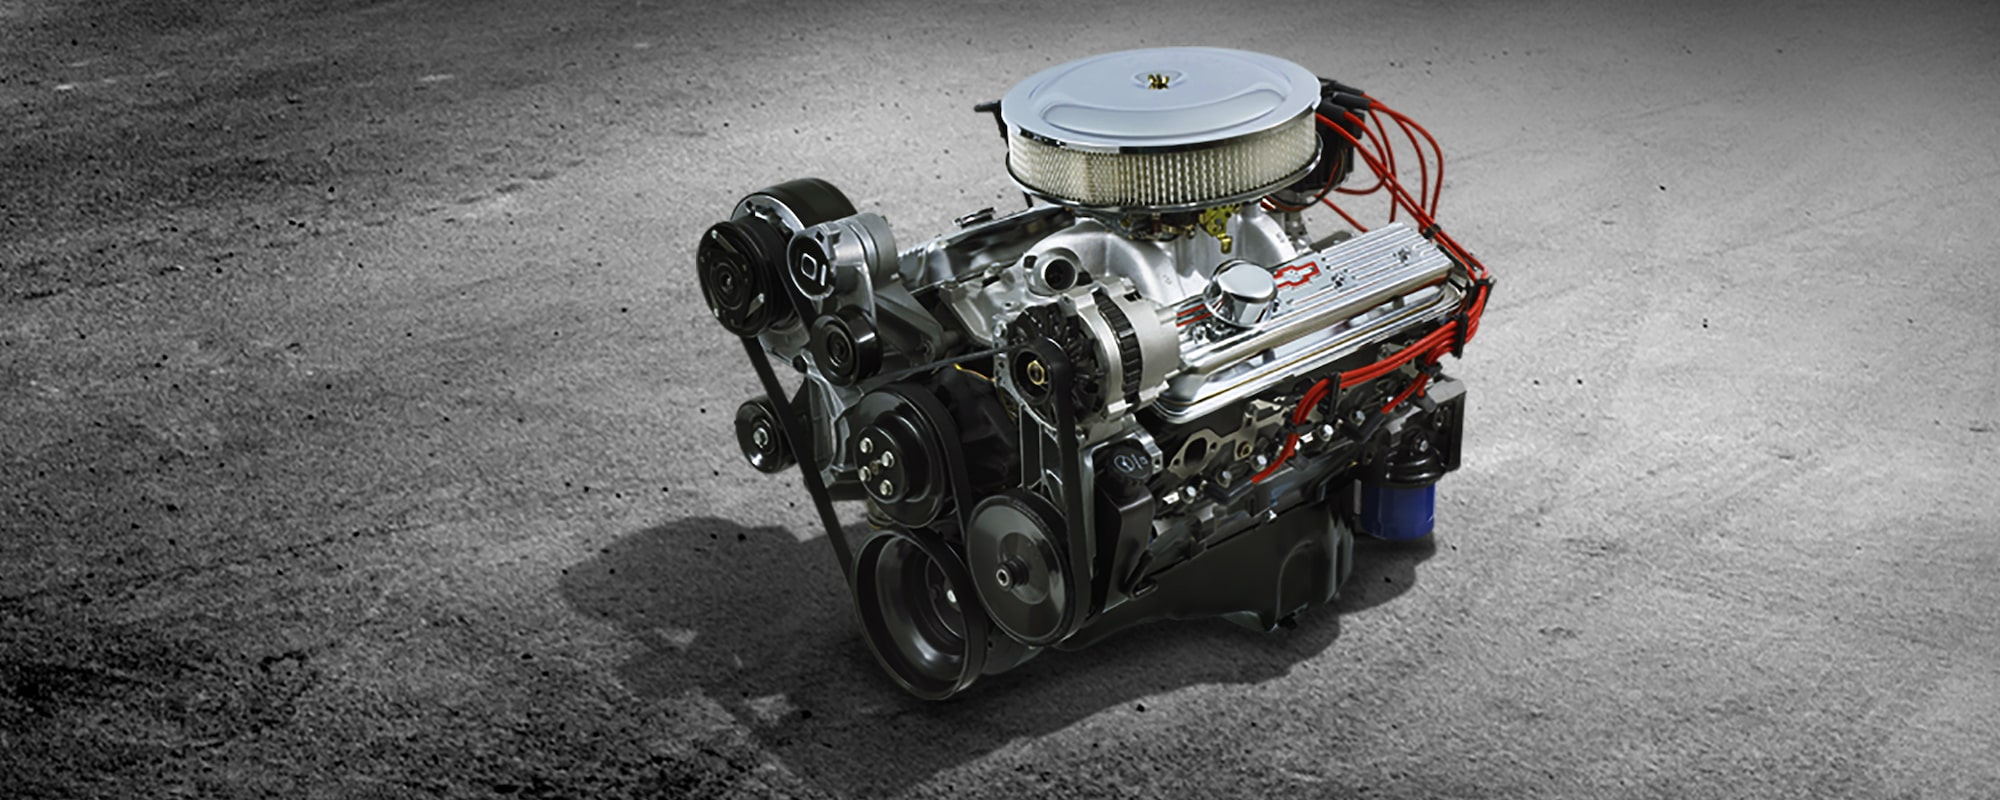 350 ho small block crate engine chevrolet performance rh chevrolet com